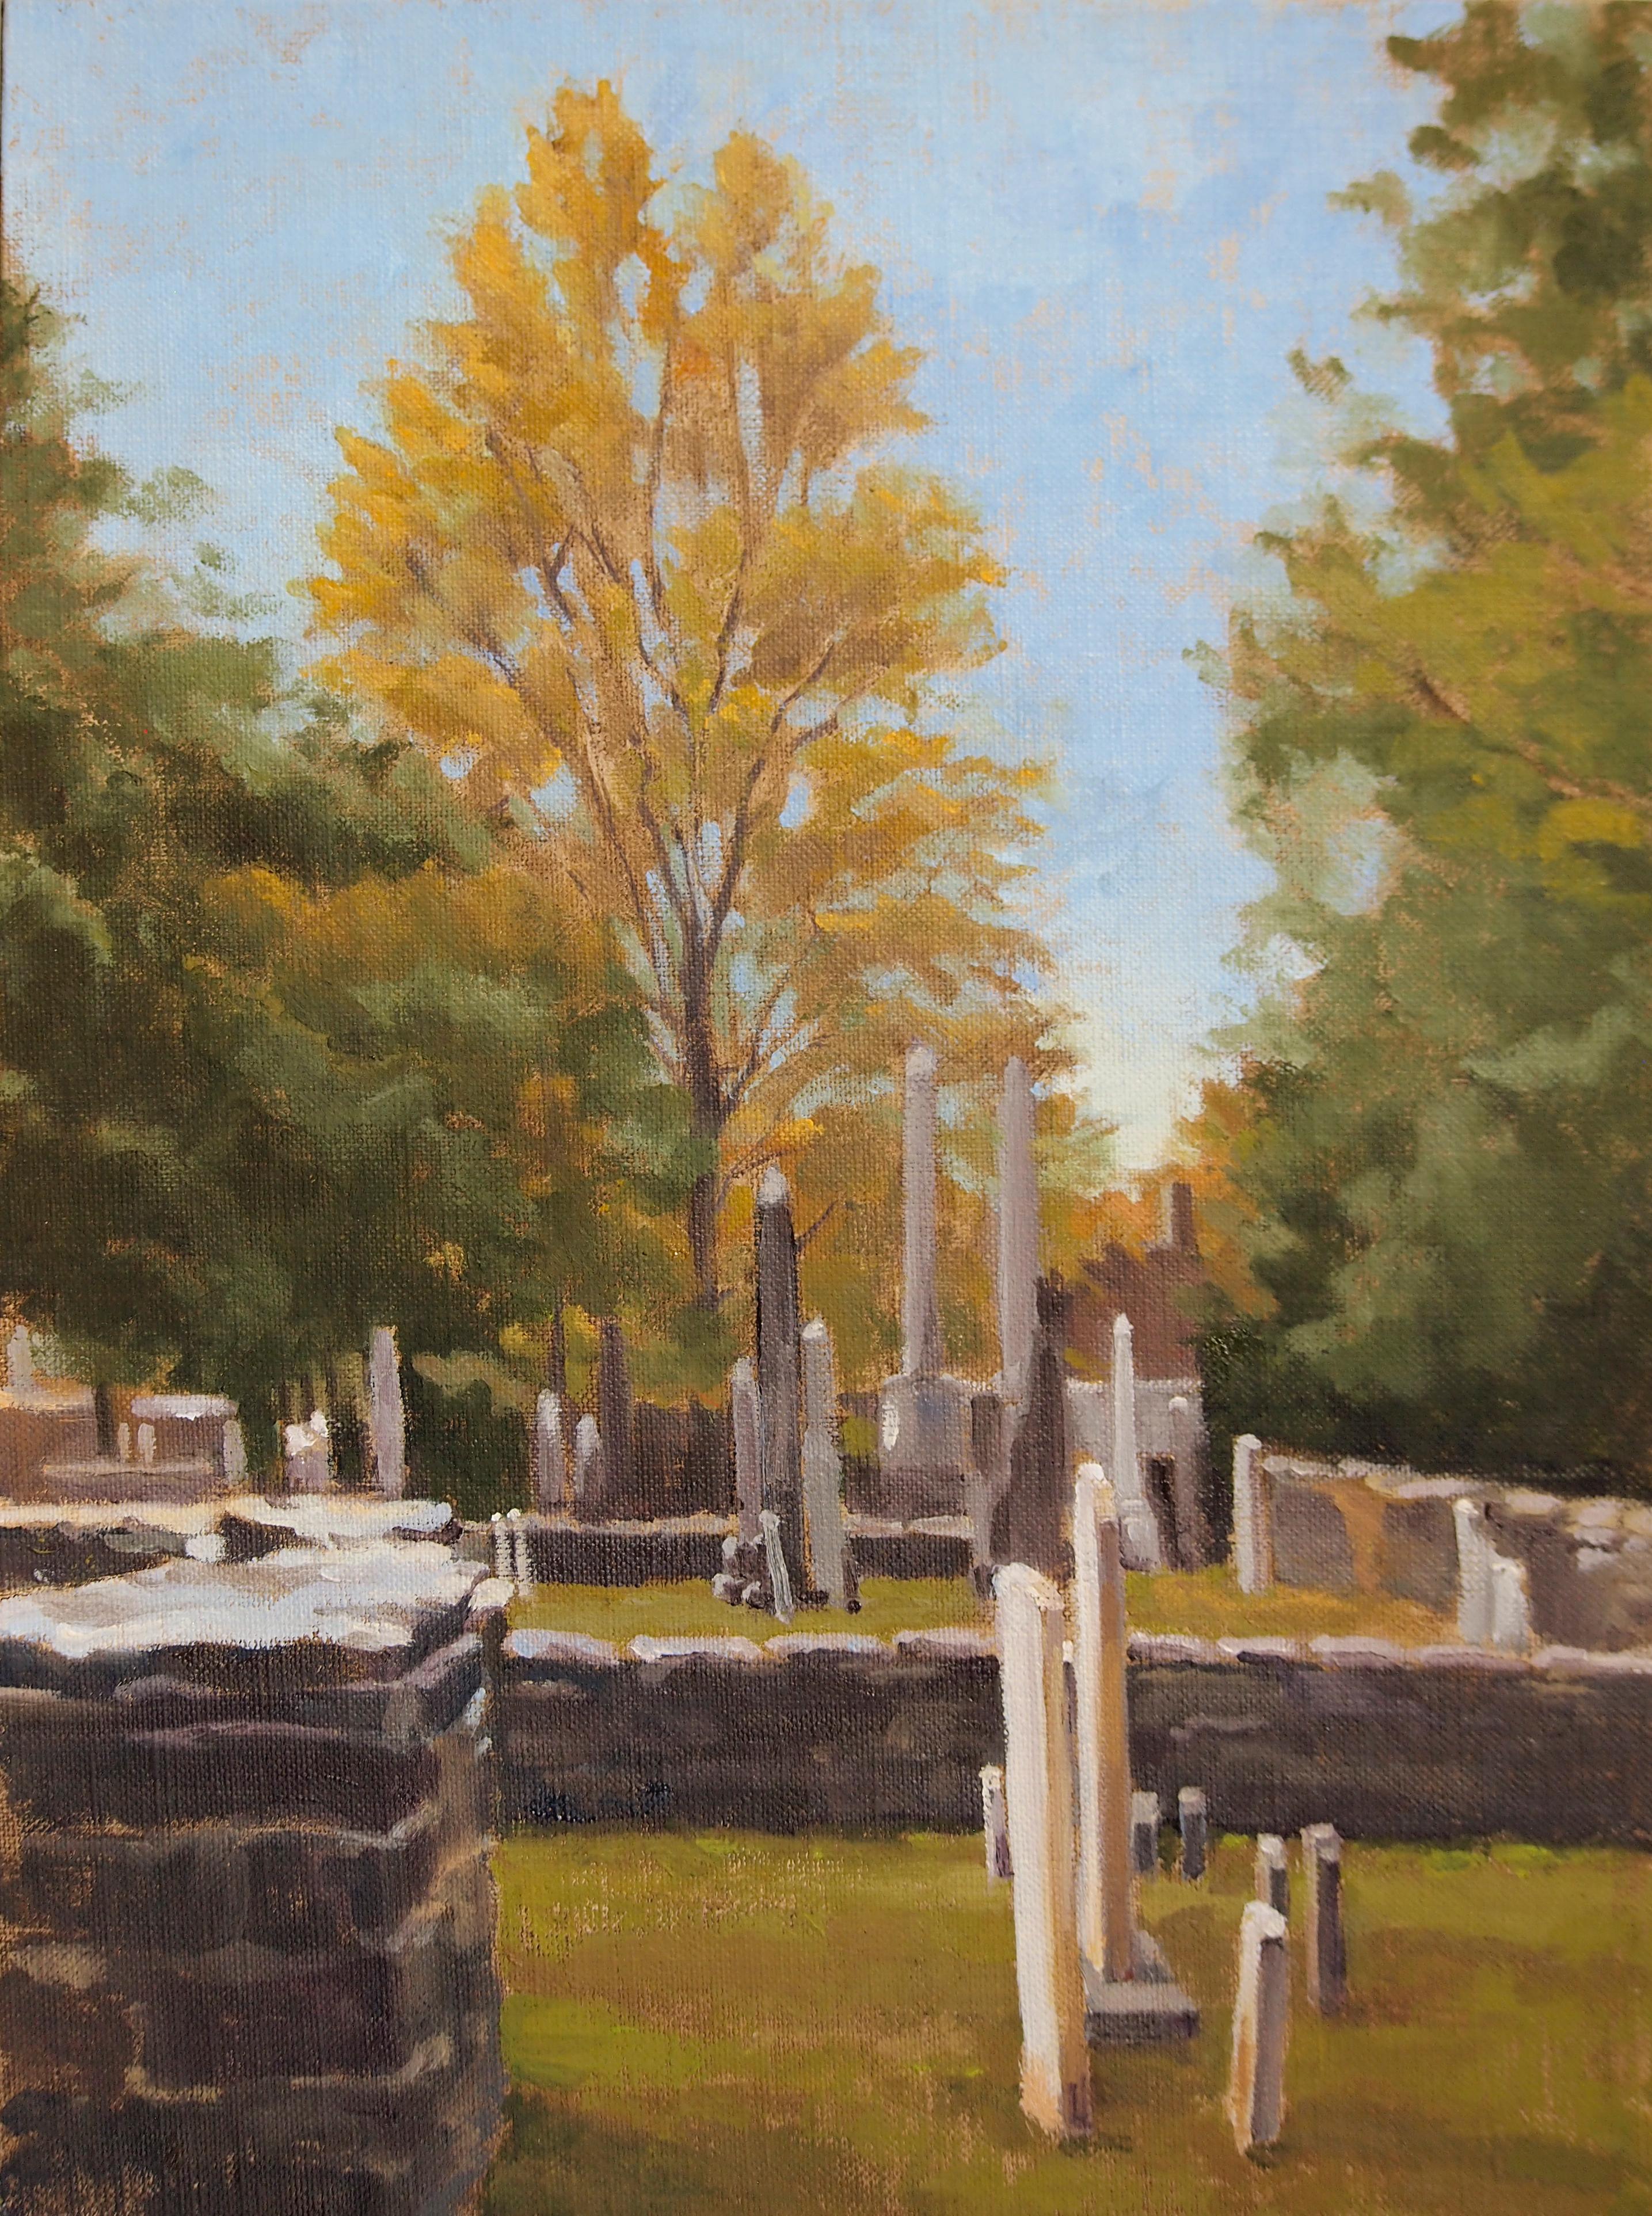 Cemetery Graves